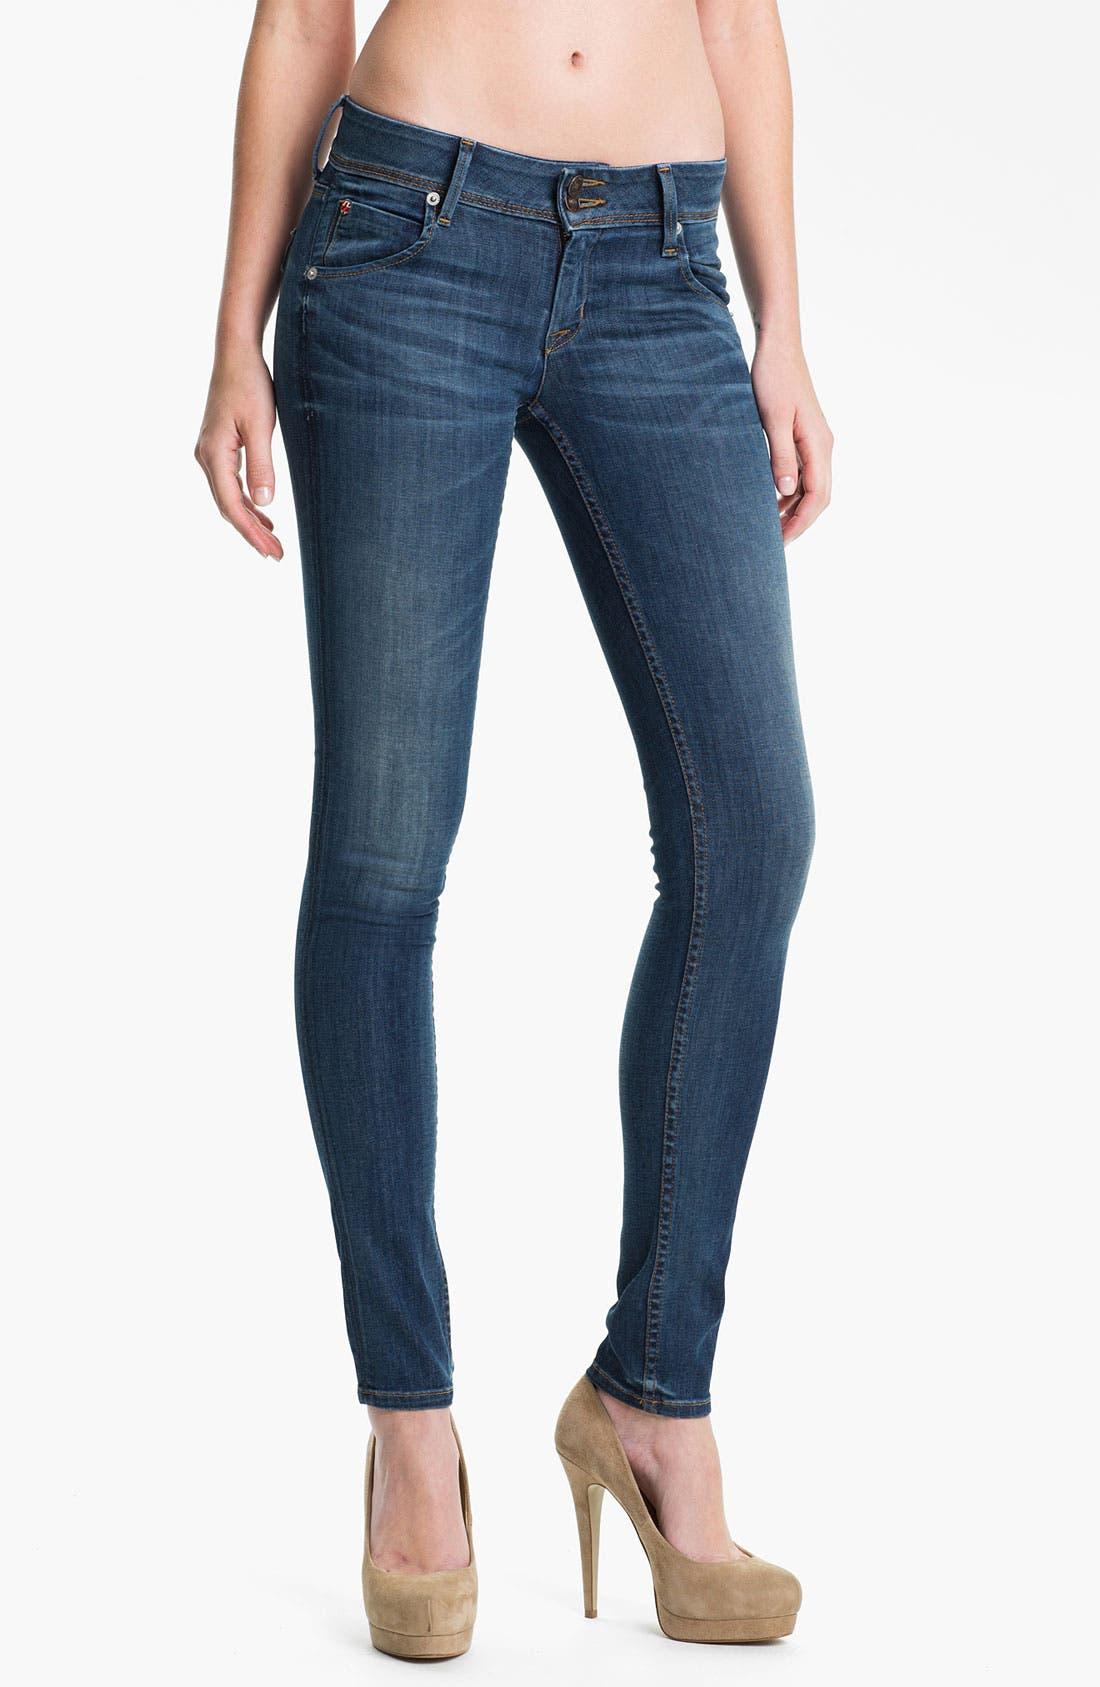 Main Image - Hudson Jeans 'Collin' Skinny Jeans (Stella)